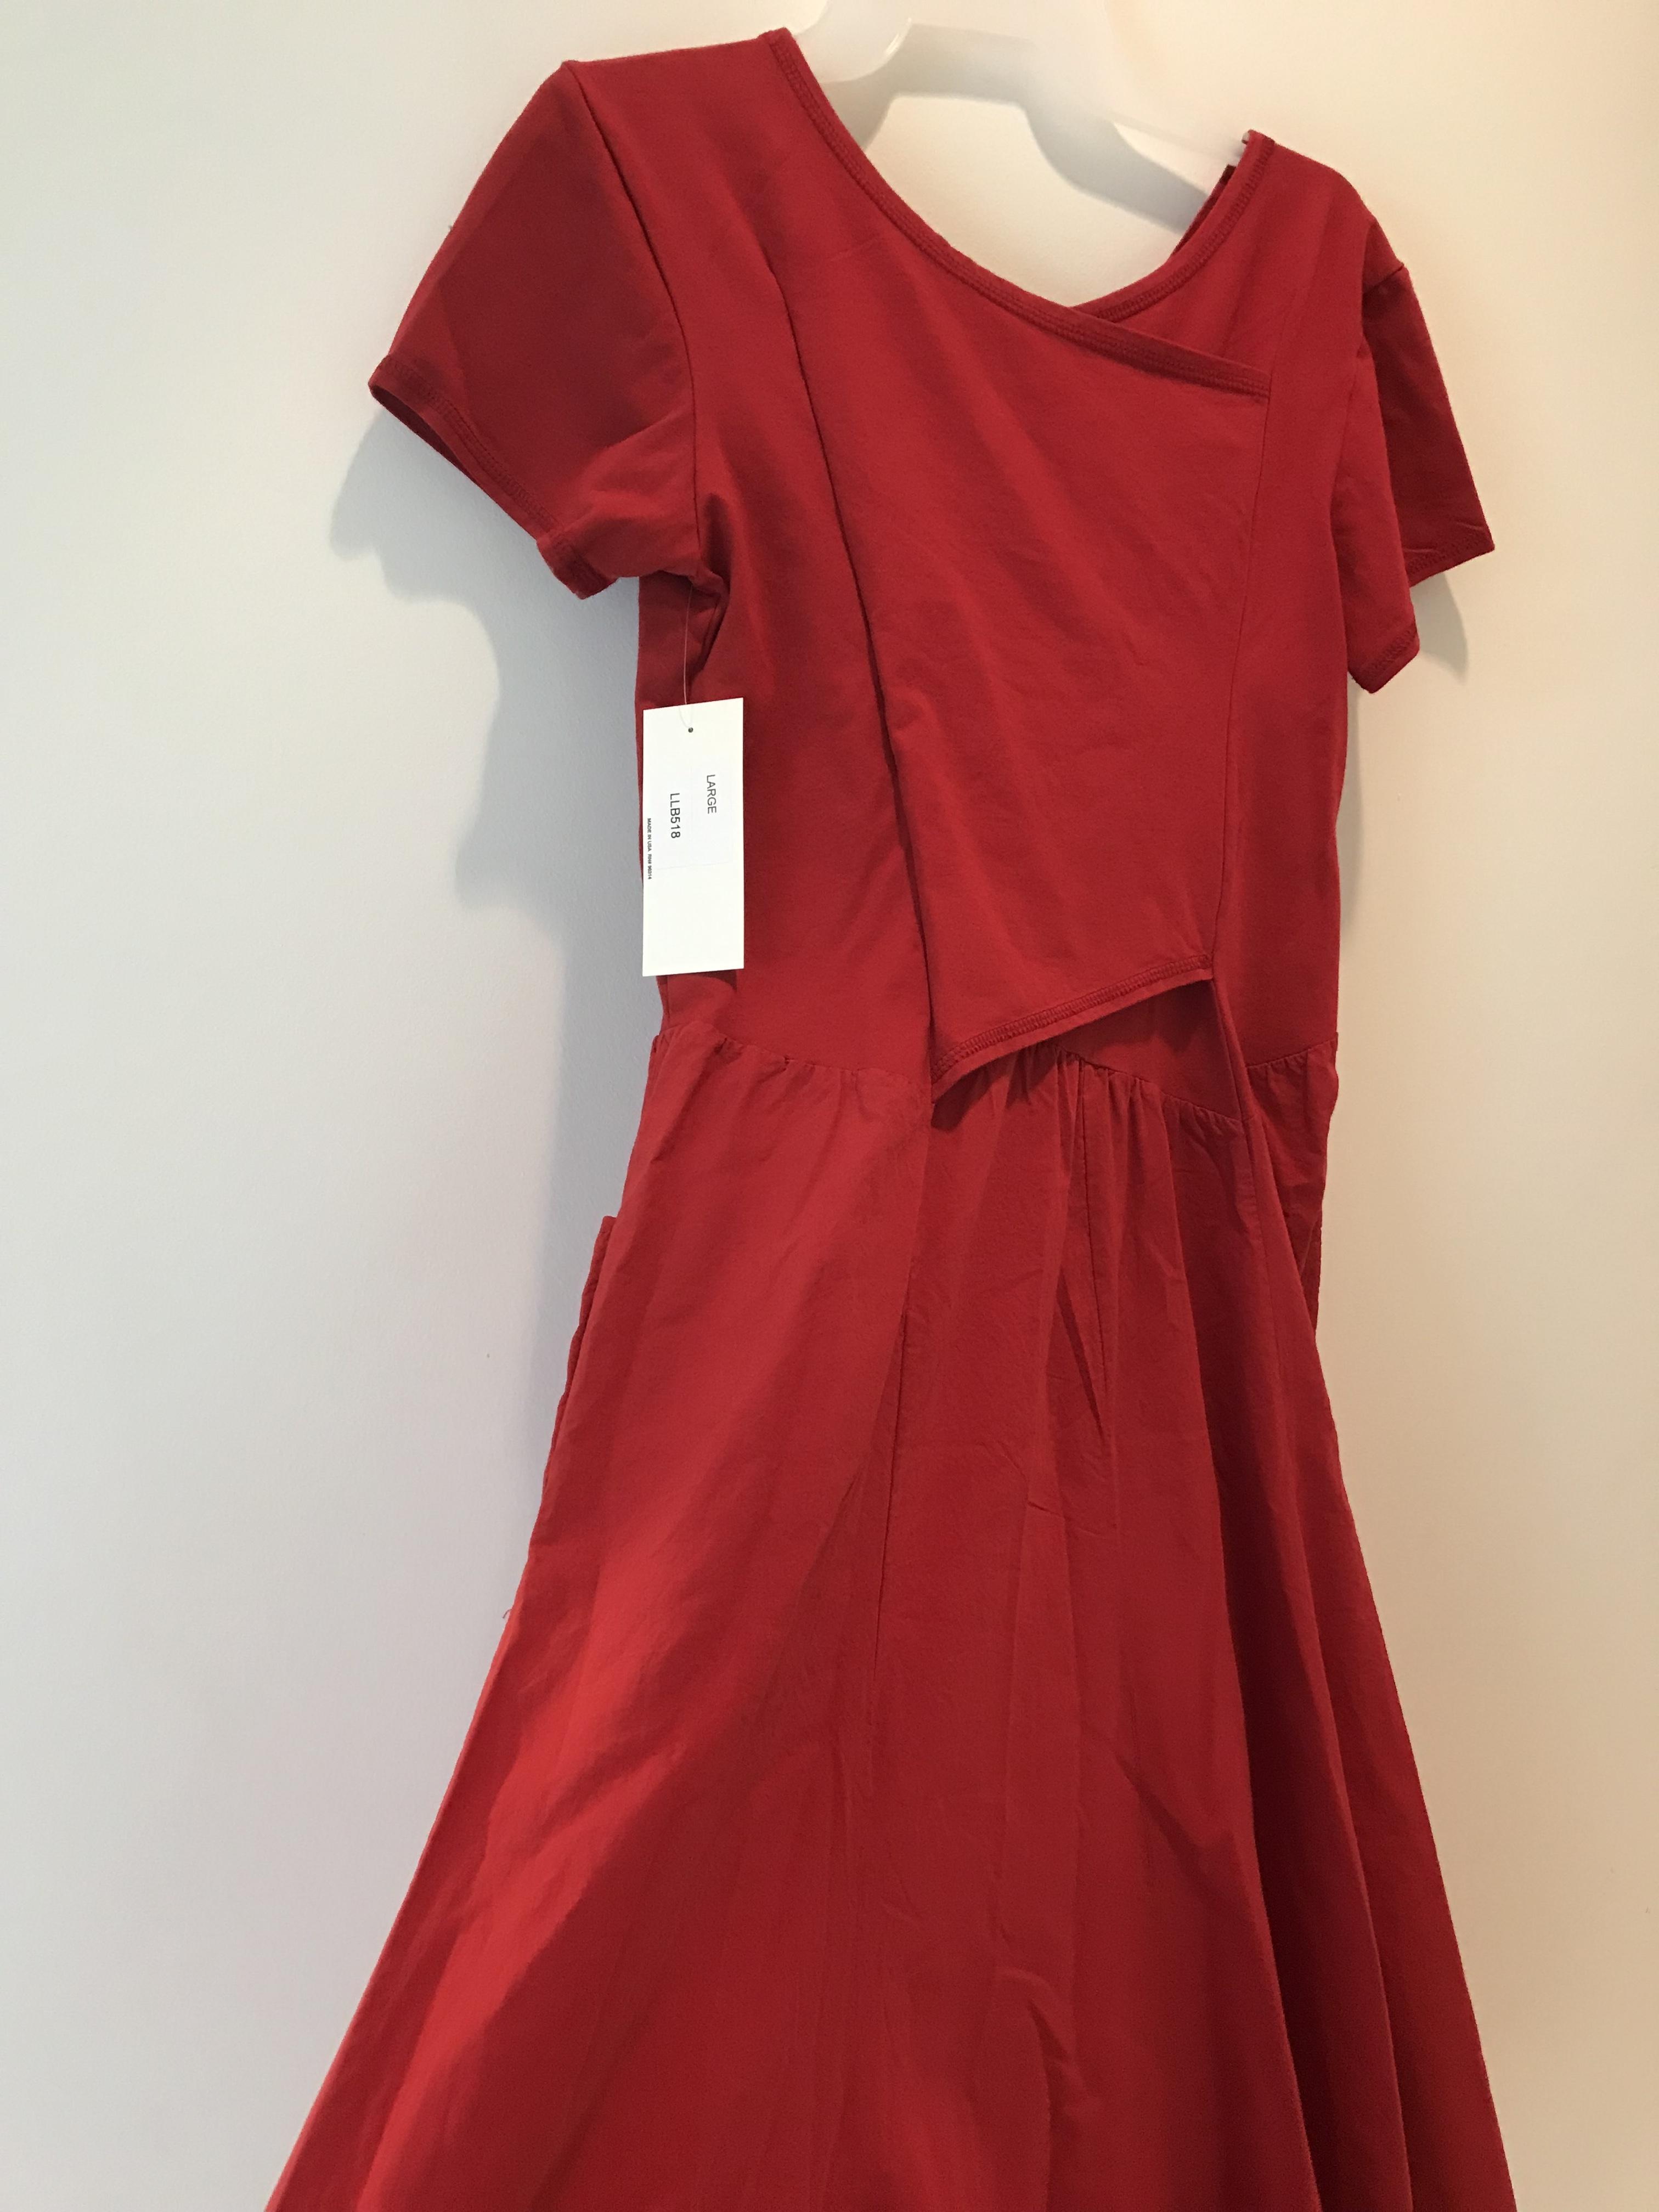 Luna Luz: Short Sleeve Cross Over Bodice Long Dress  (Ships Immed in Bonfire, 1 Left!)